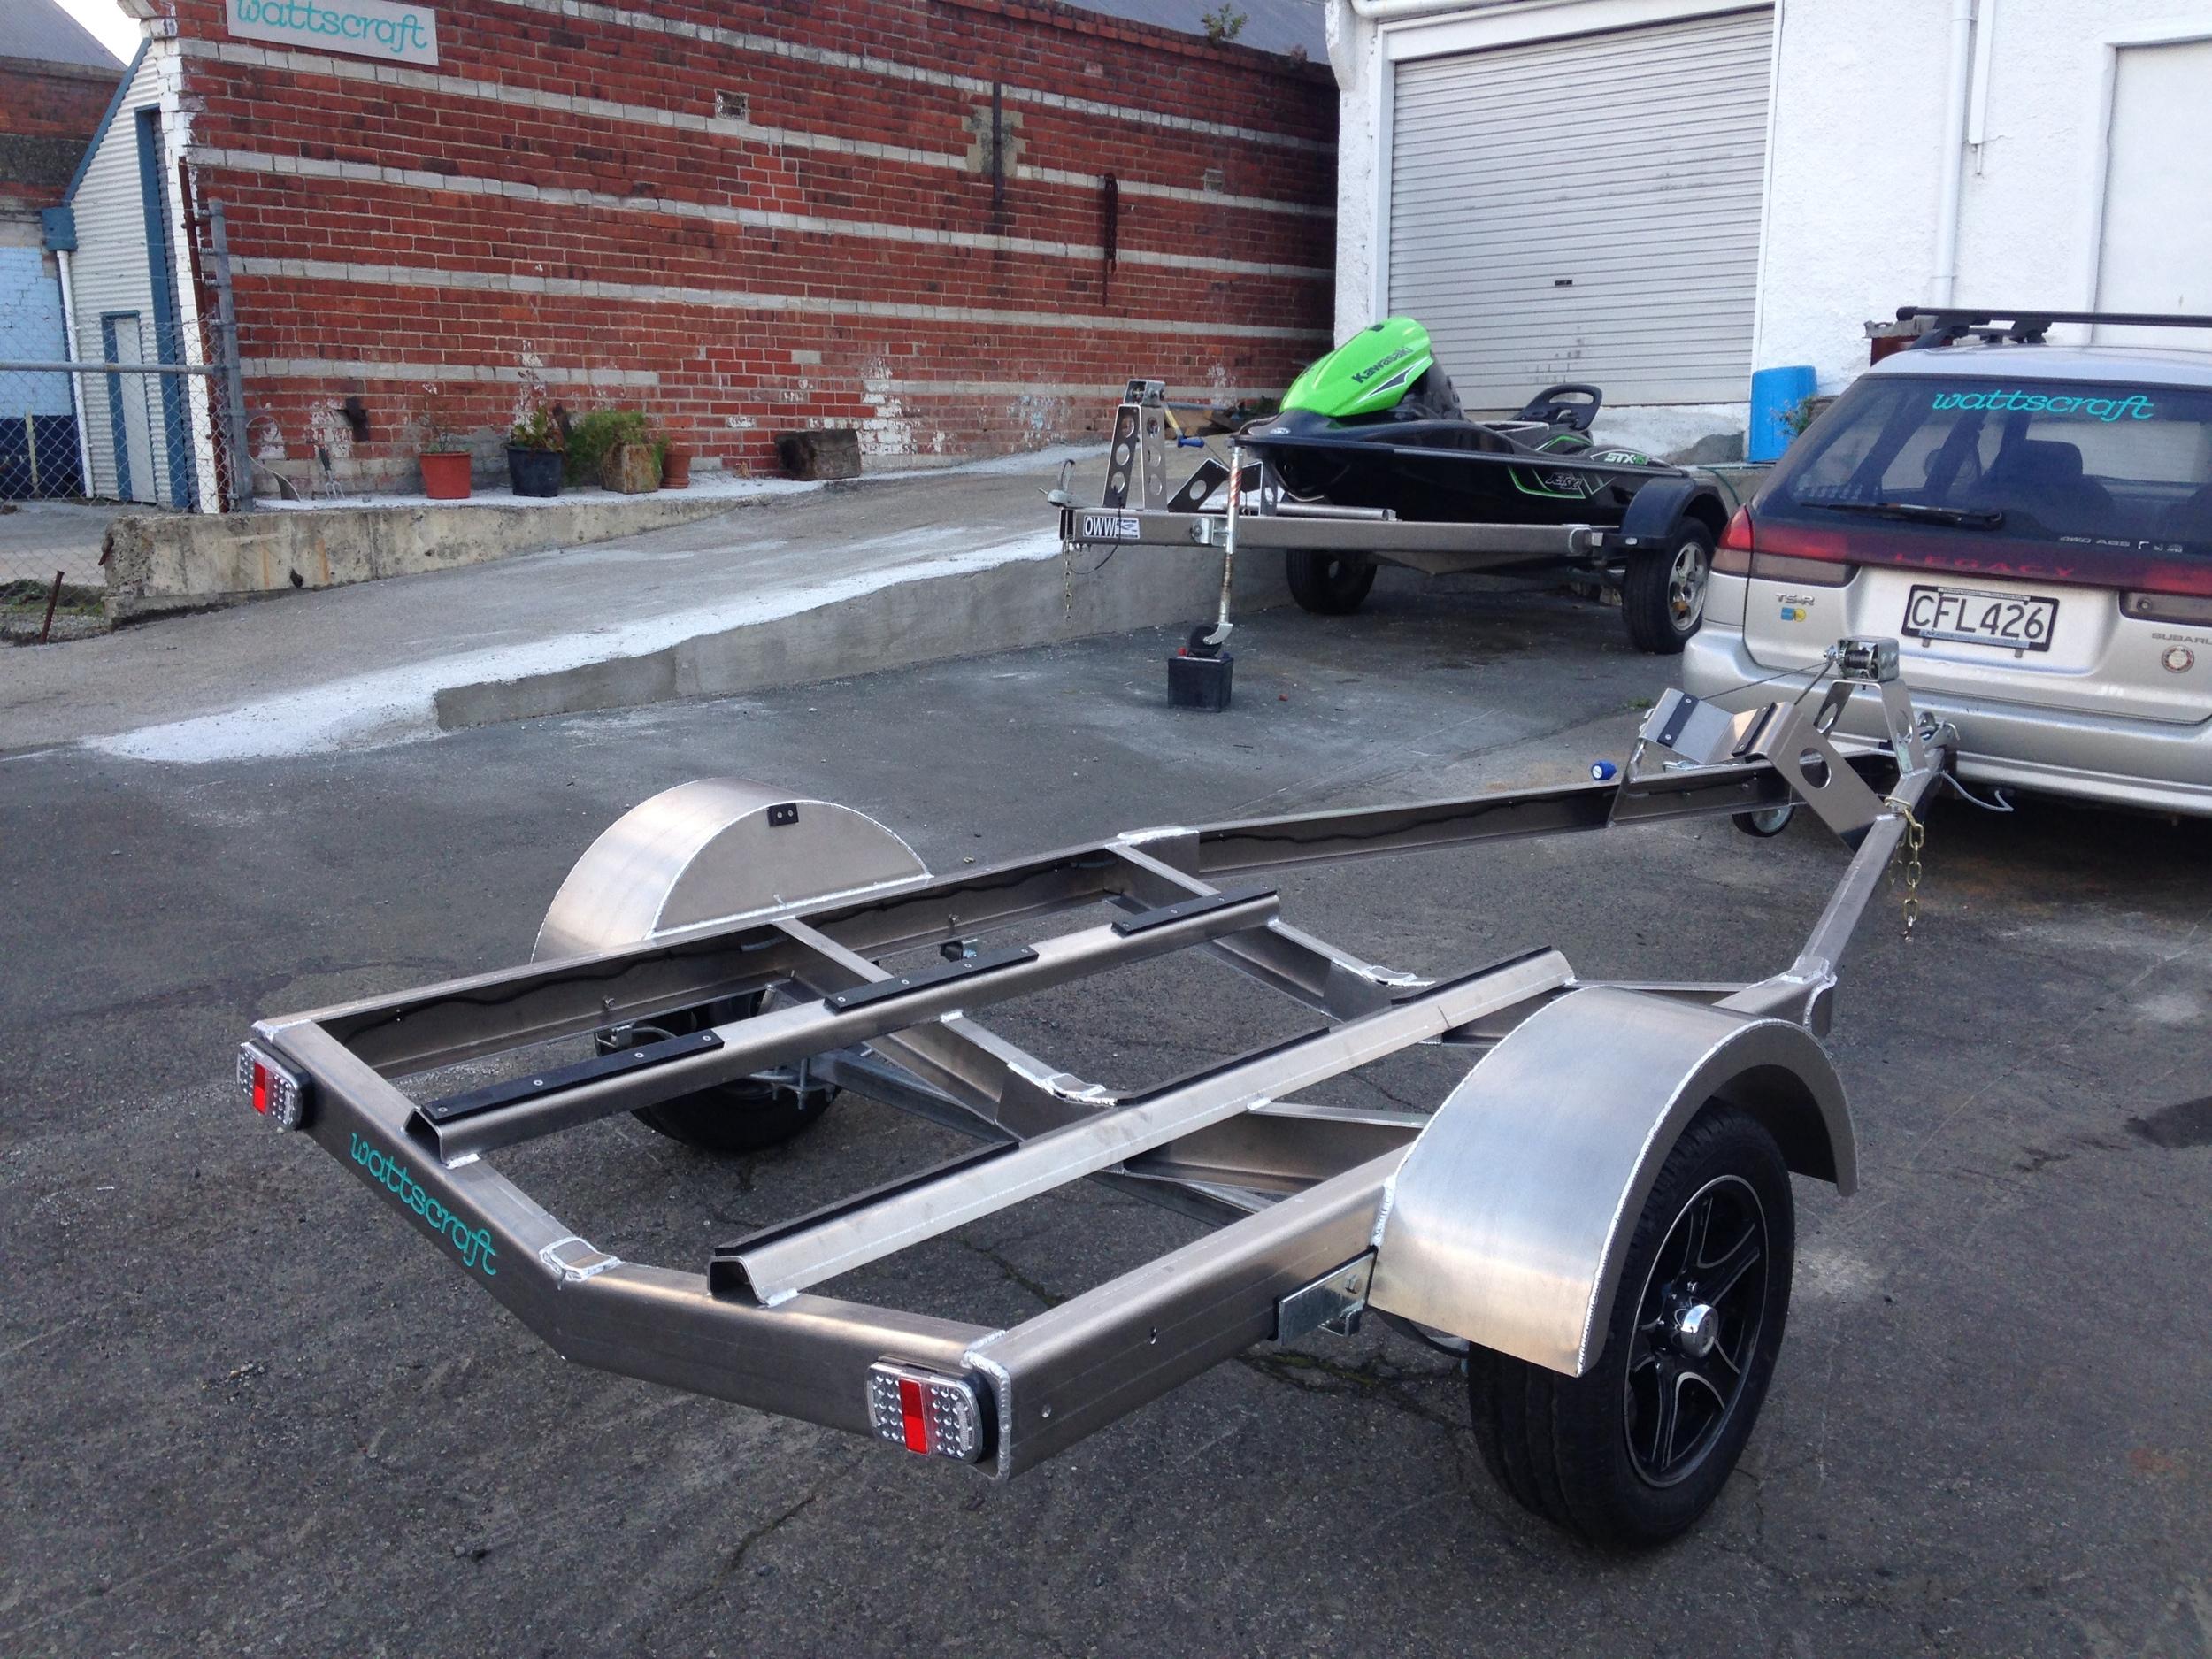 WattsCraft aluminium trailer frame kit-set